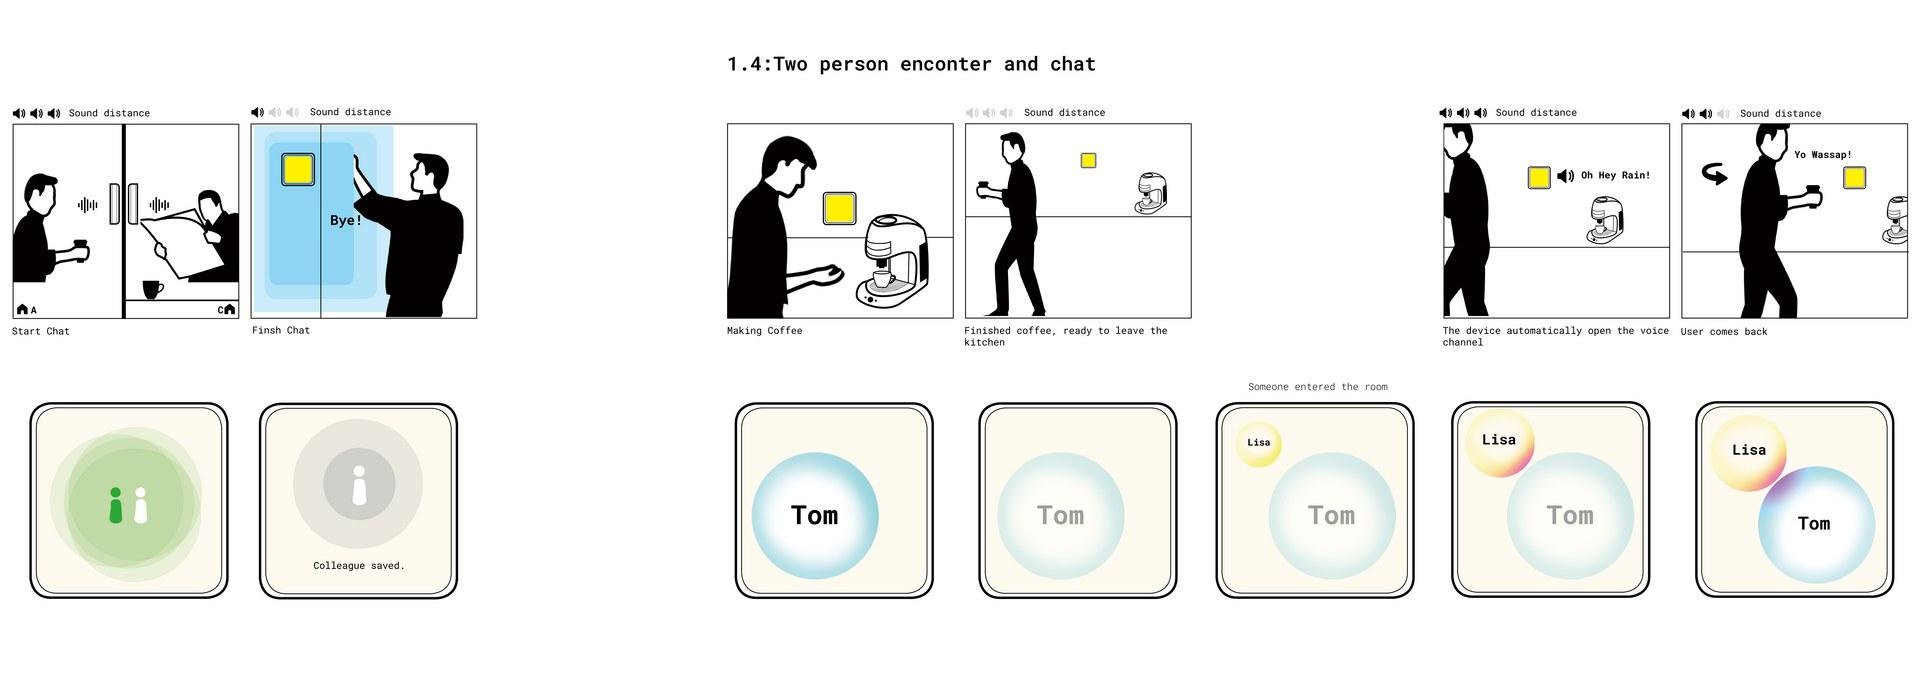 Two colleagues encounter scenario(3)